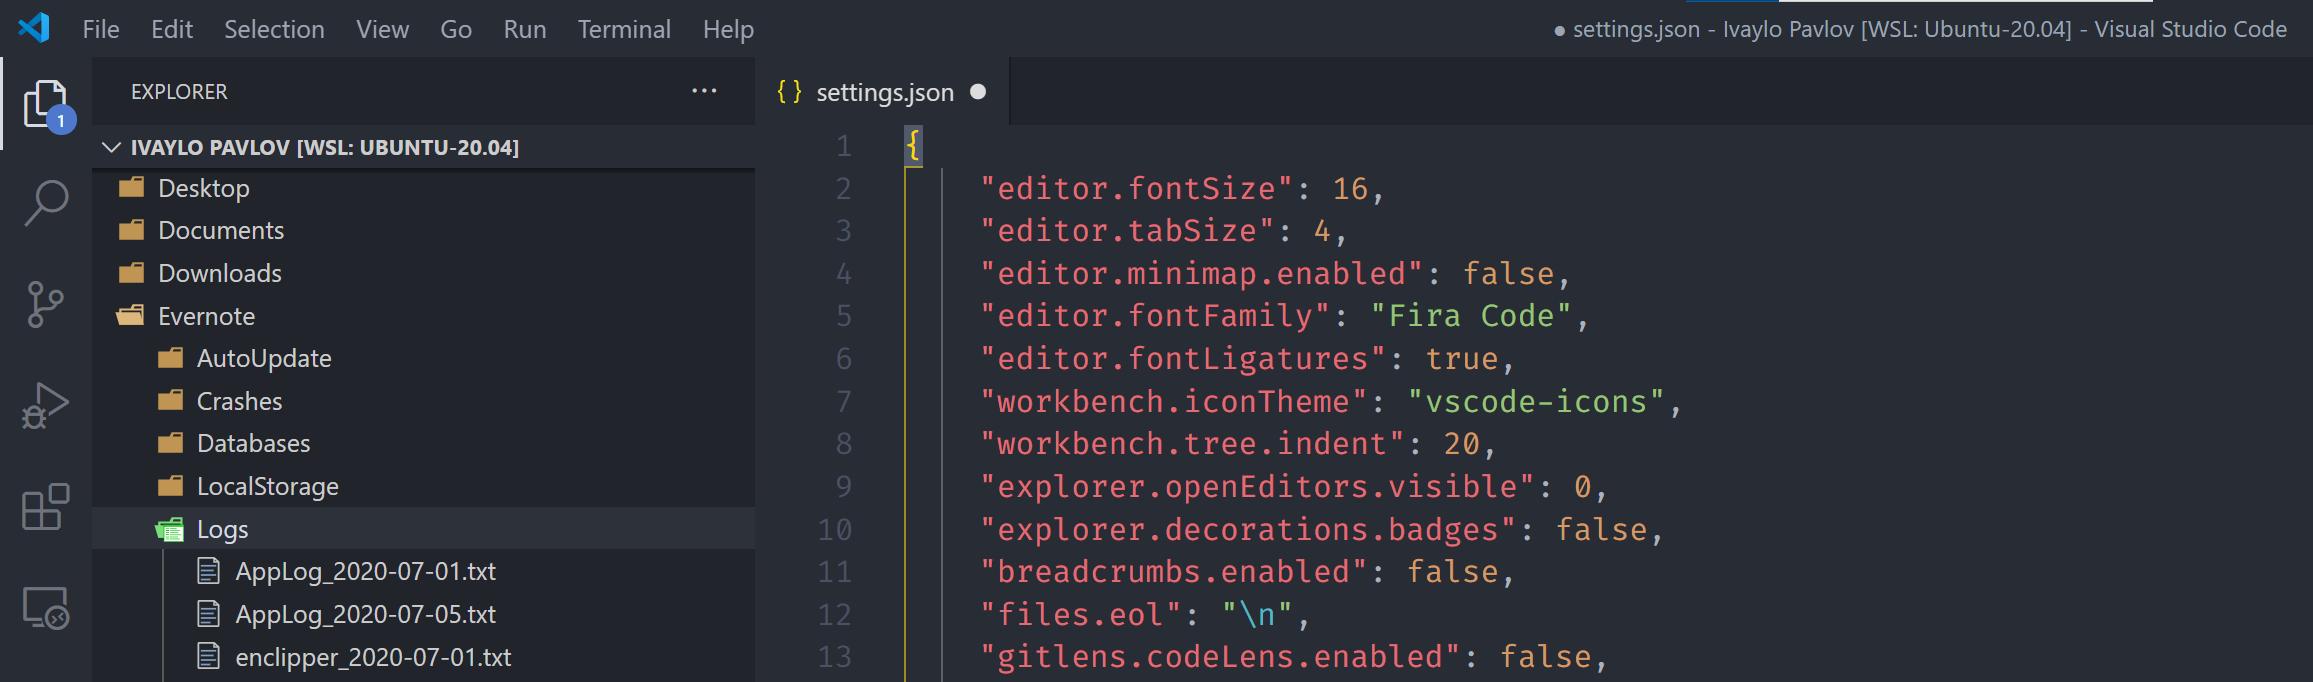 visual studio code minimalist file explorer